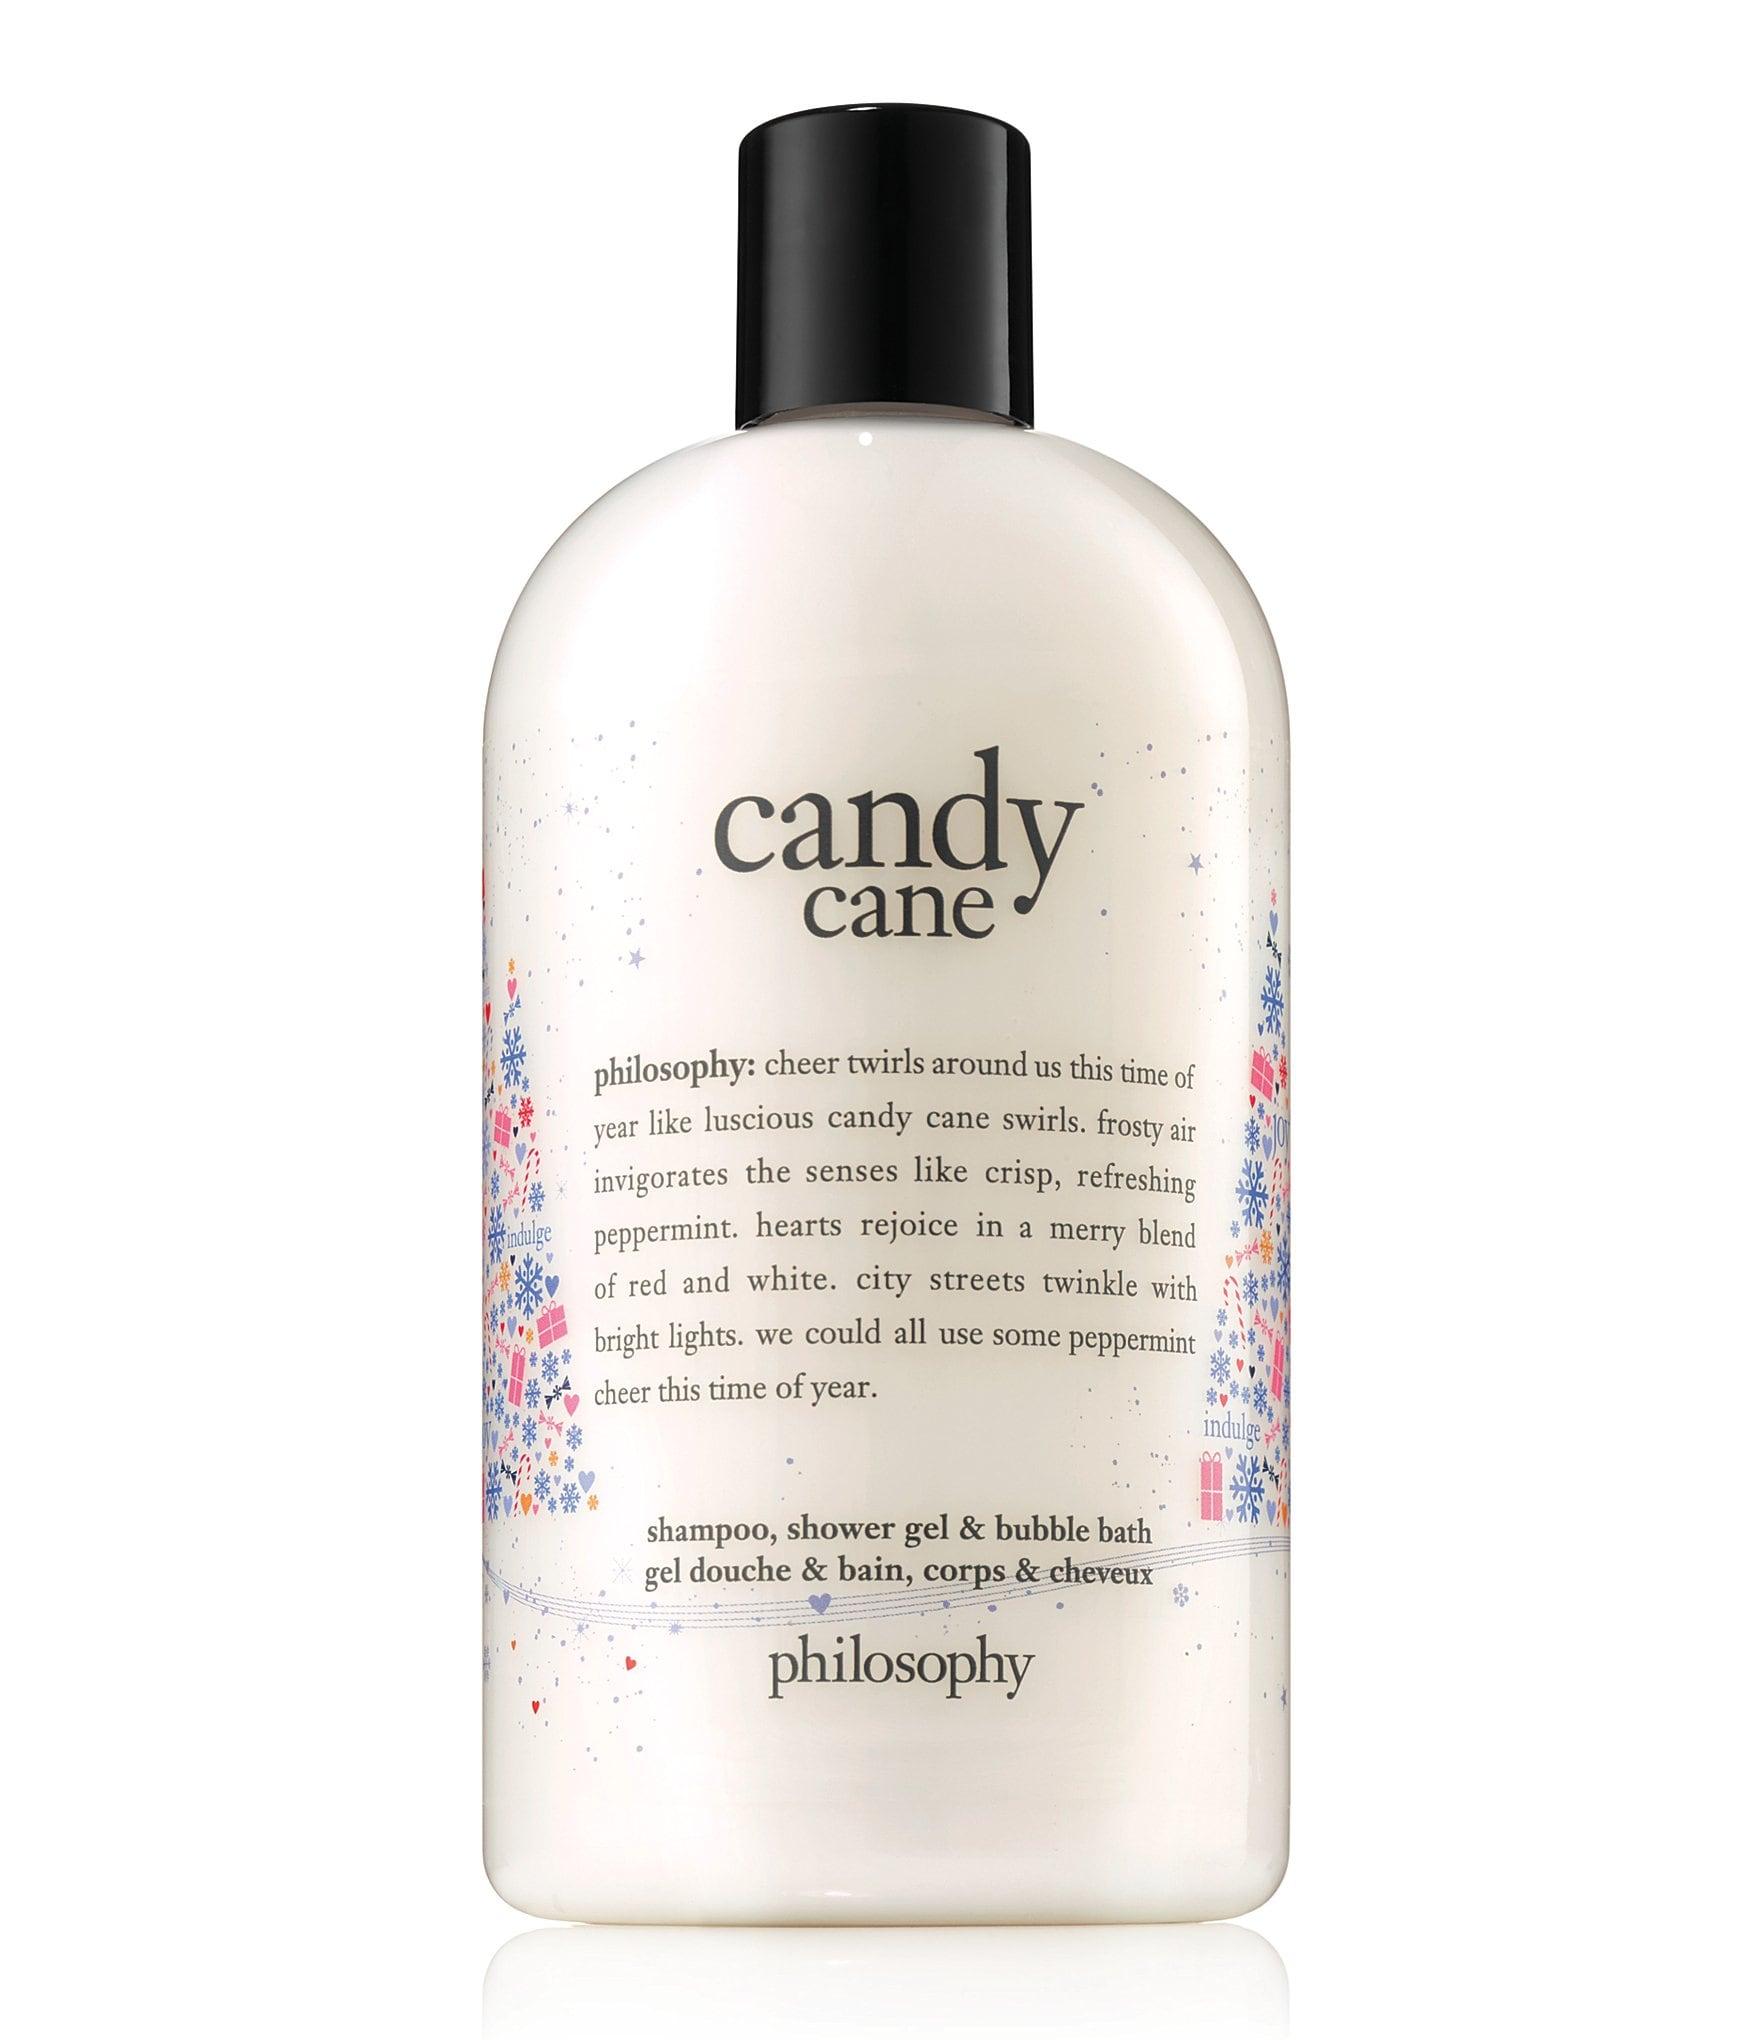 Philosophy Candy Cane Shampoo Shower Gel Amp Bubble Bath